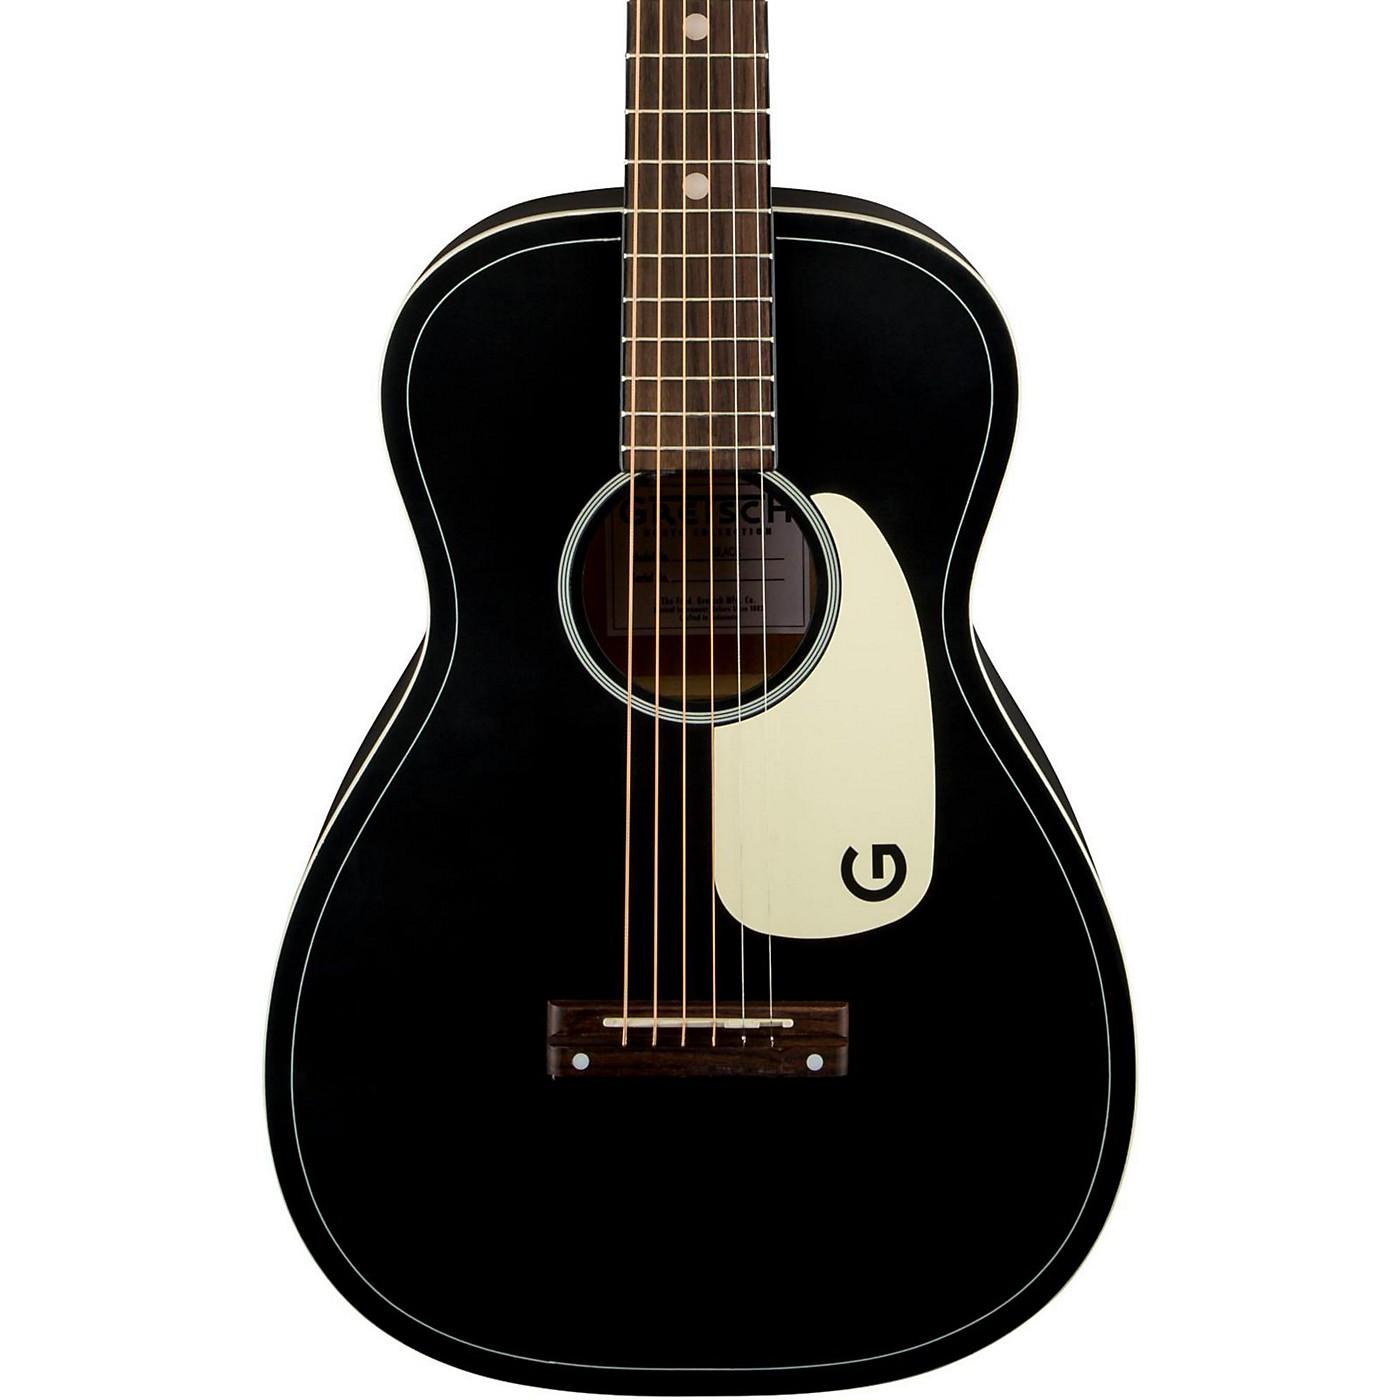 Gretsch Guitars G9520 Jim Dandy Flat Top Acoustic Guitar thumbnail